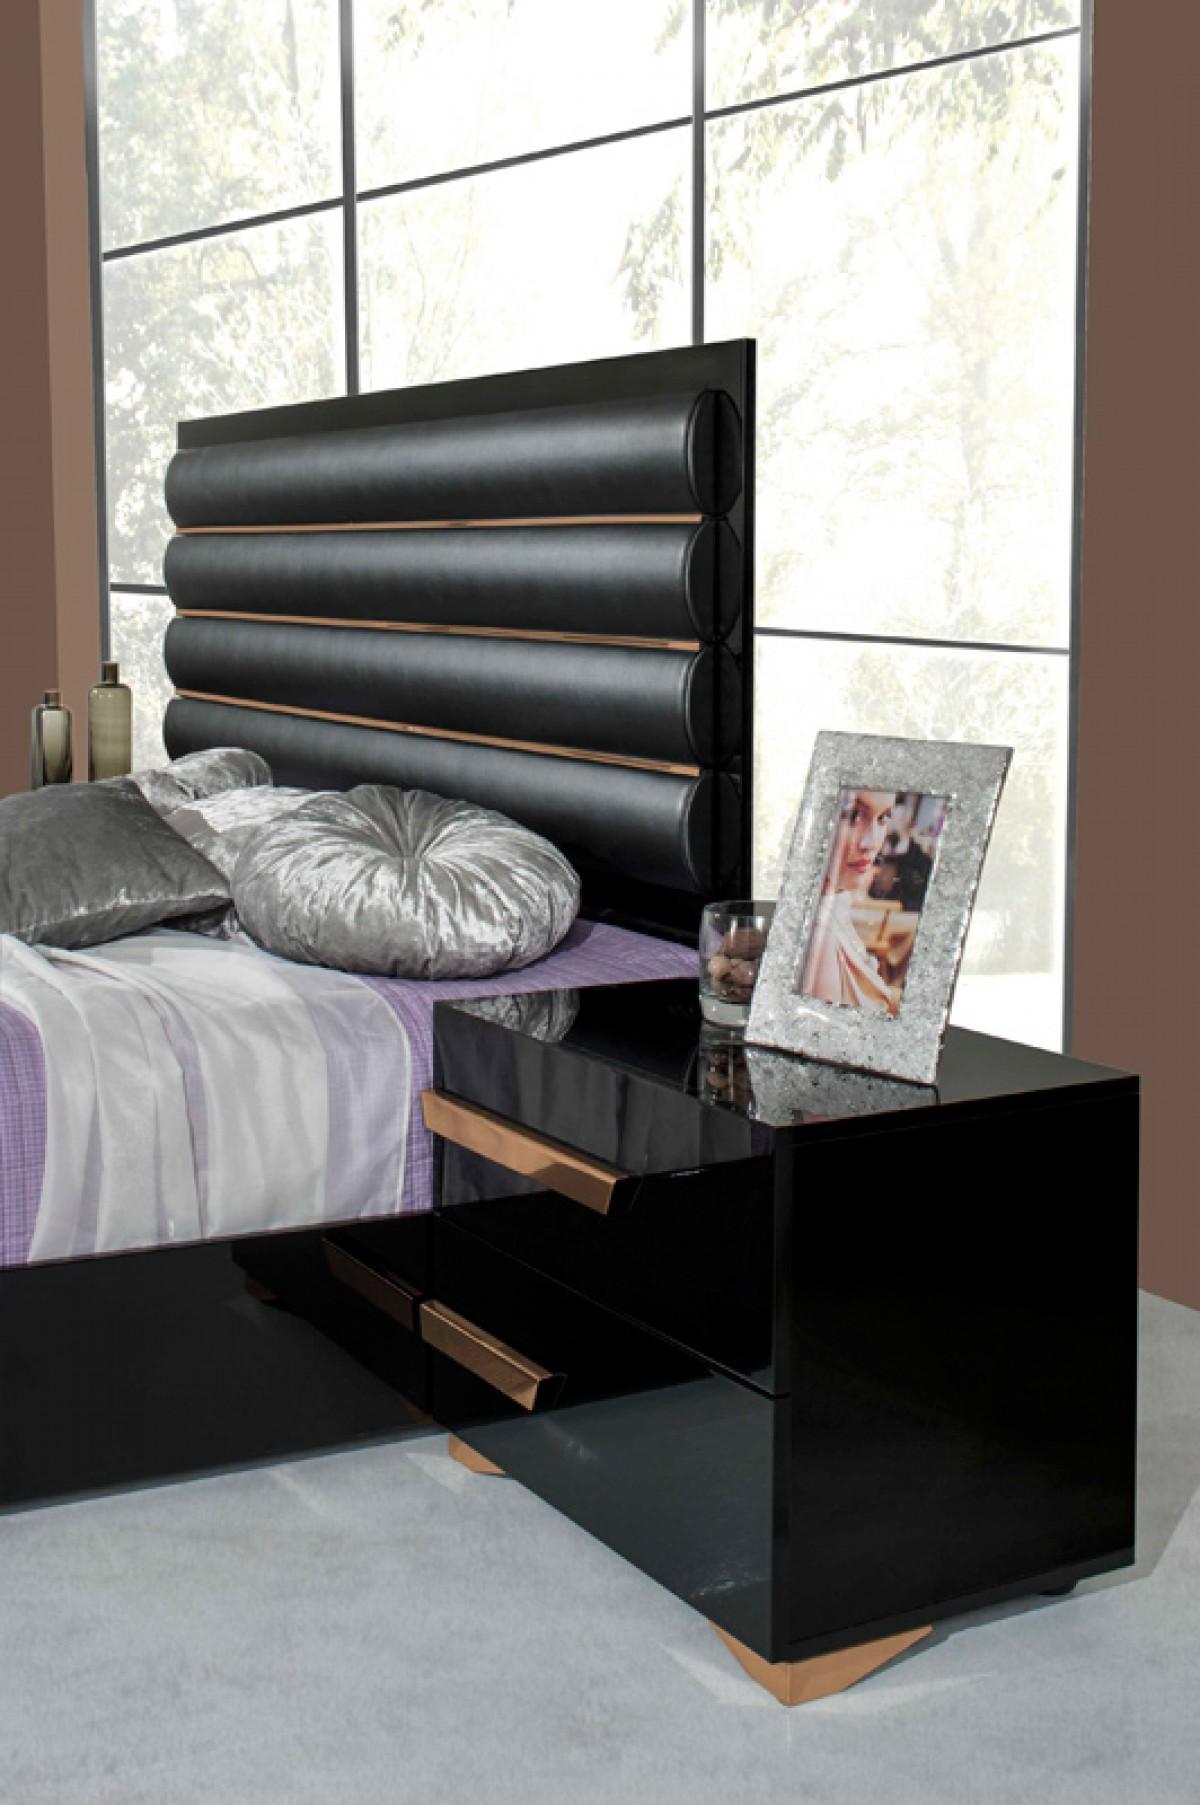 Modern Italian Bedroom Furniture Sets: VIG Furniture 5Pc Queen Bedroom Set #VGACROMEO